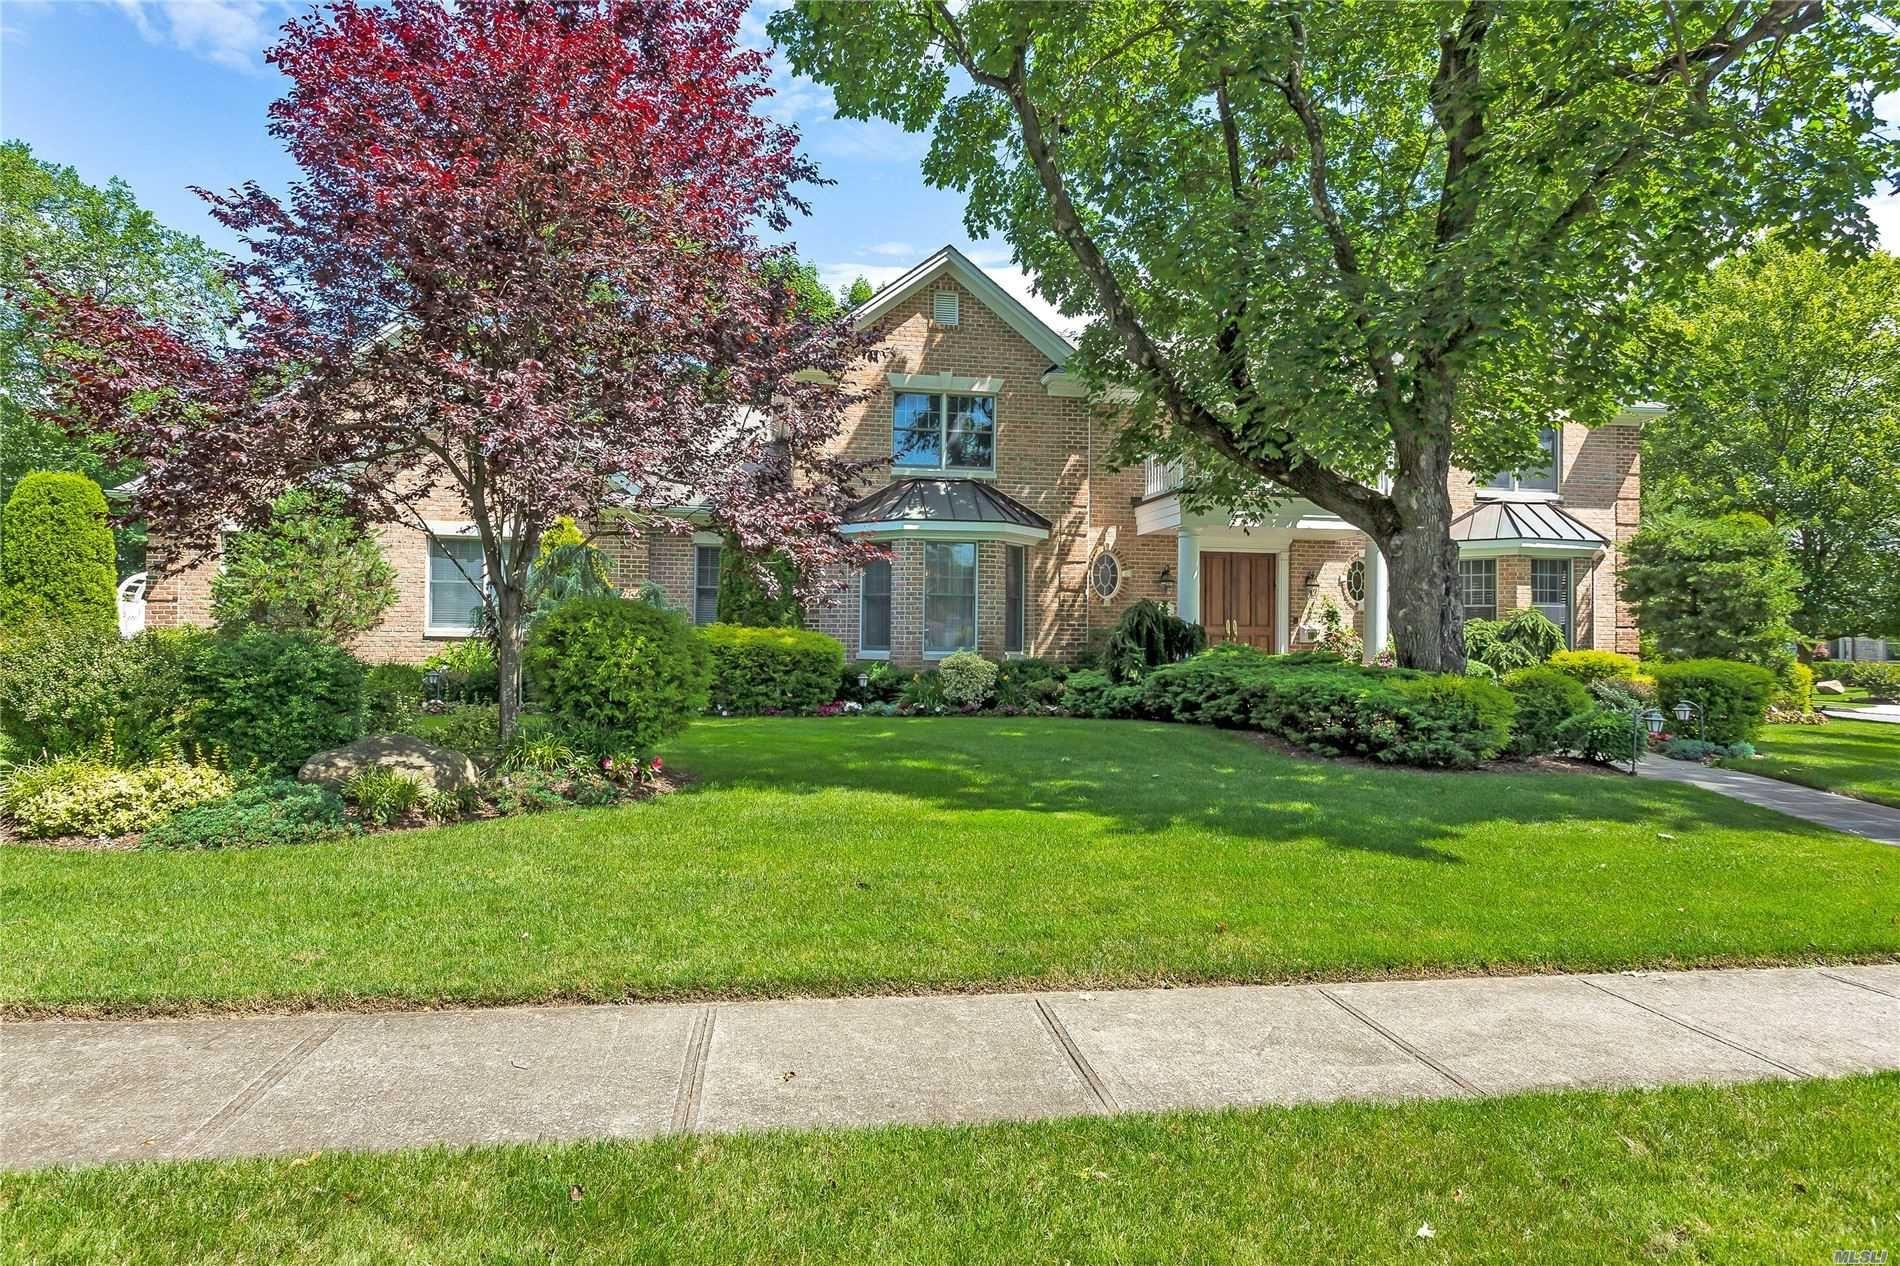 33 Knoll Lane, Roslyn Heights, NY 11577 - MLS#: 3145559